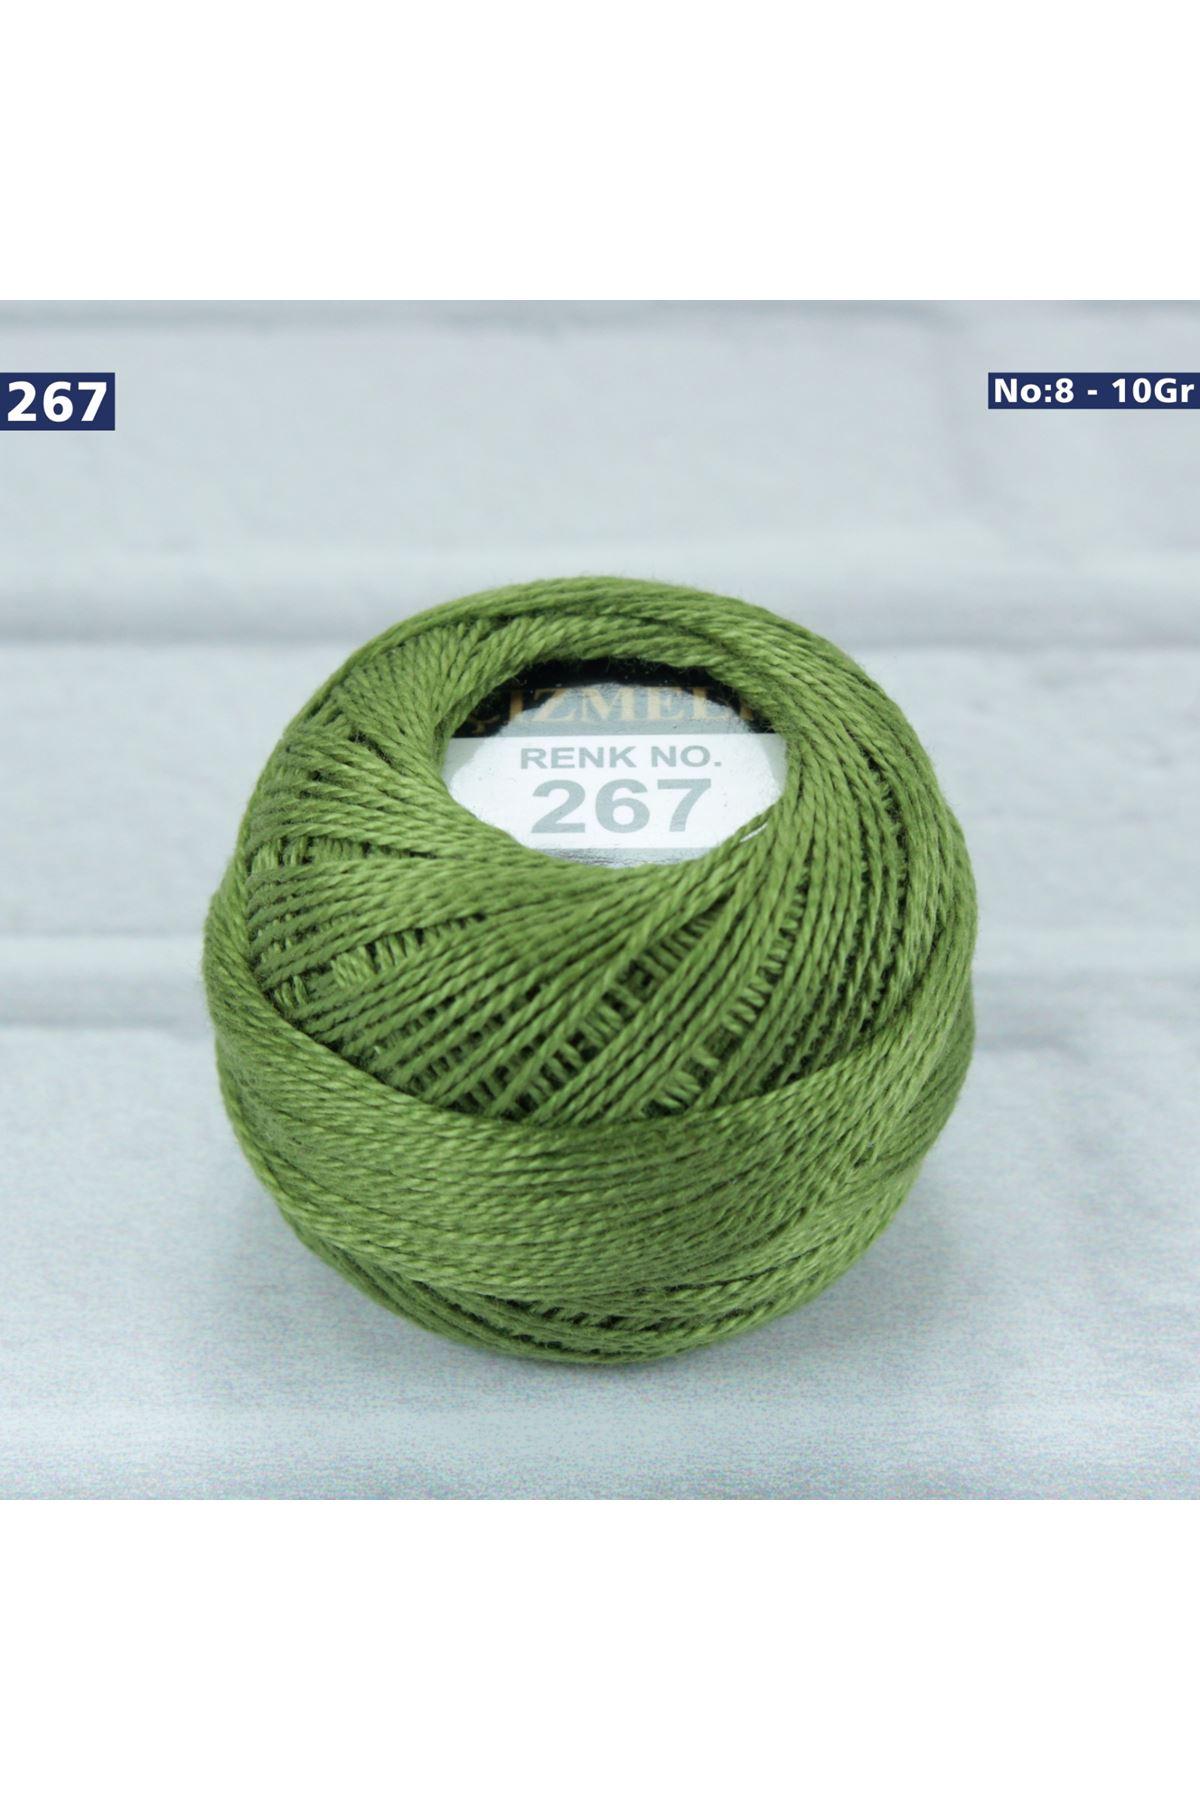 Çizmeli Cotton Perle Nakış İpliği No: 267